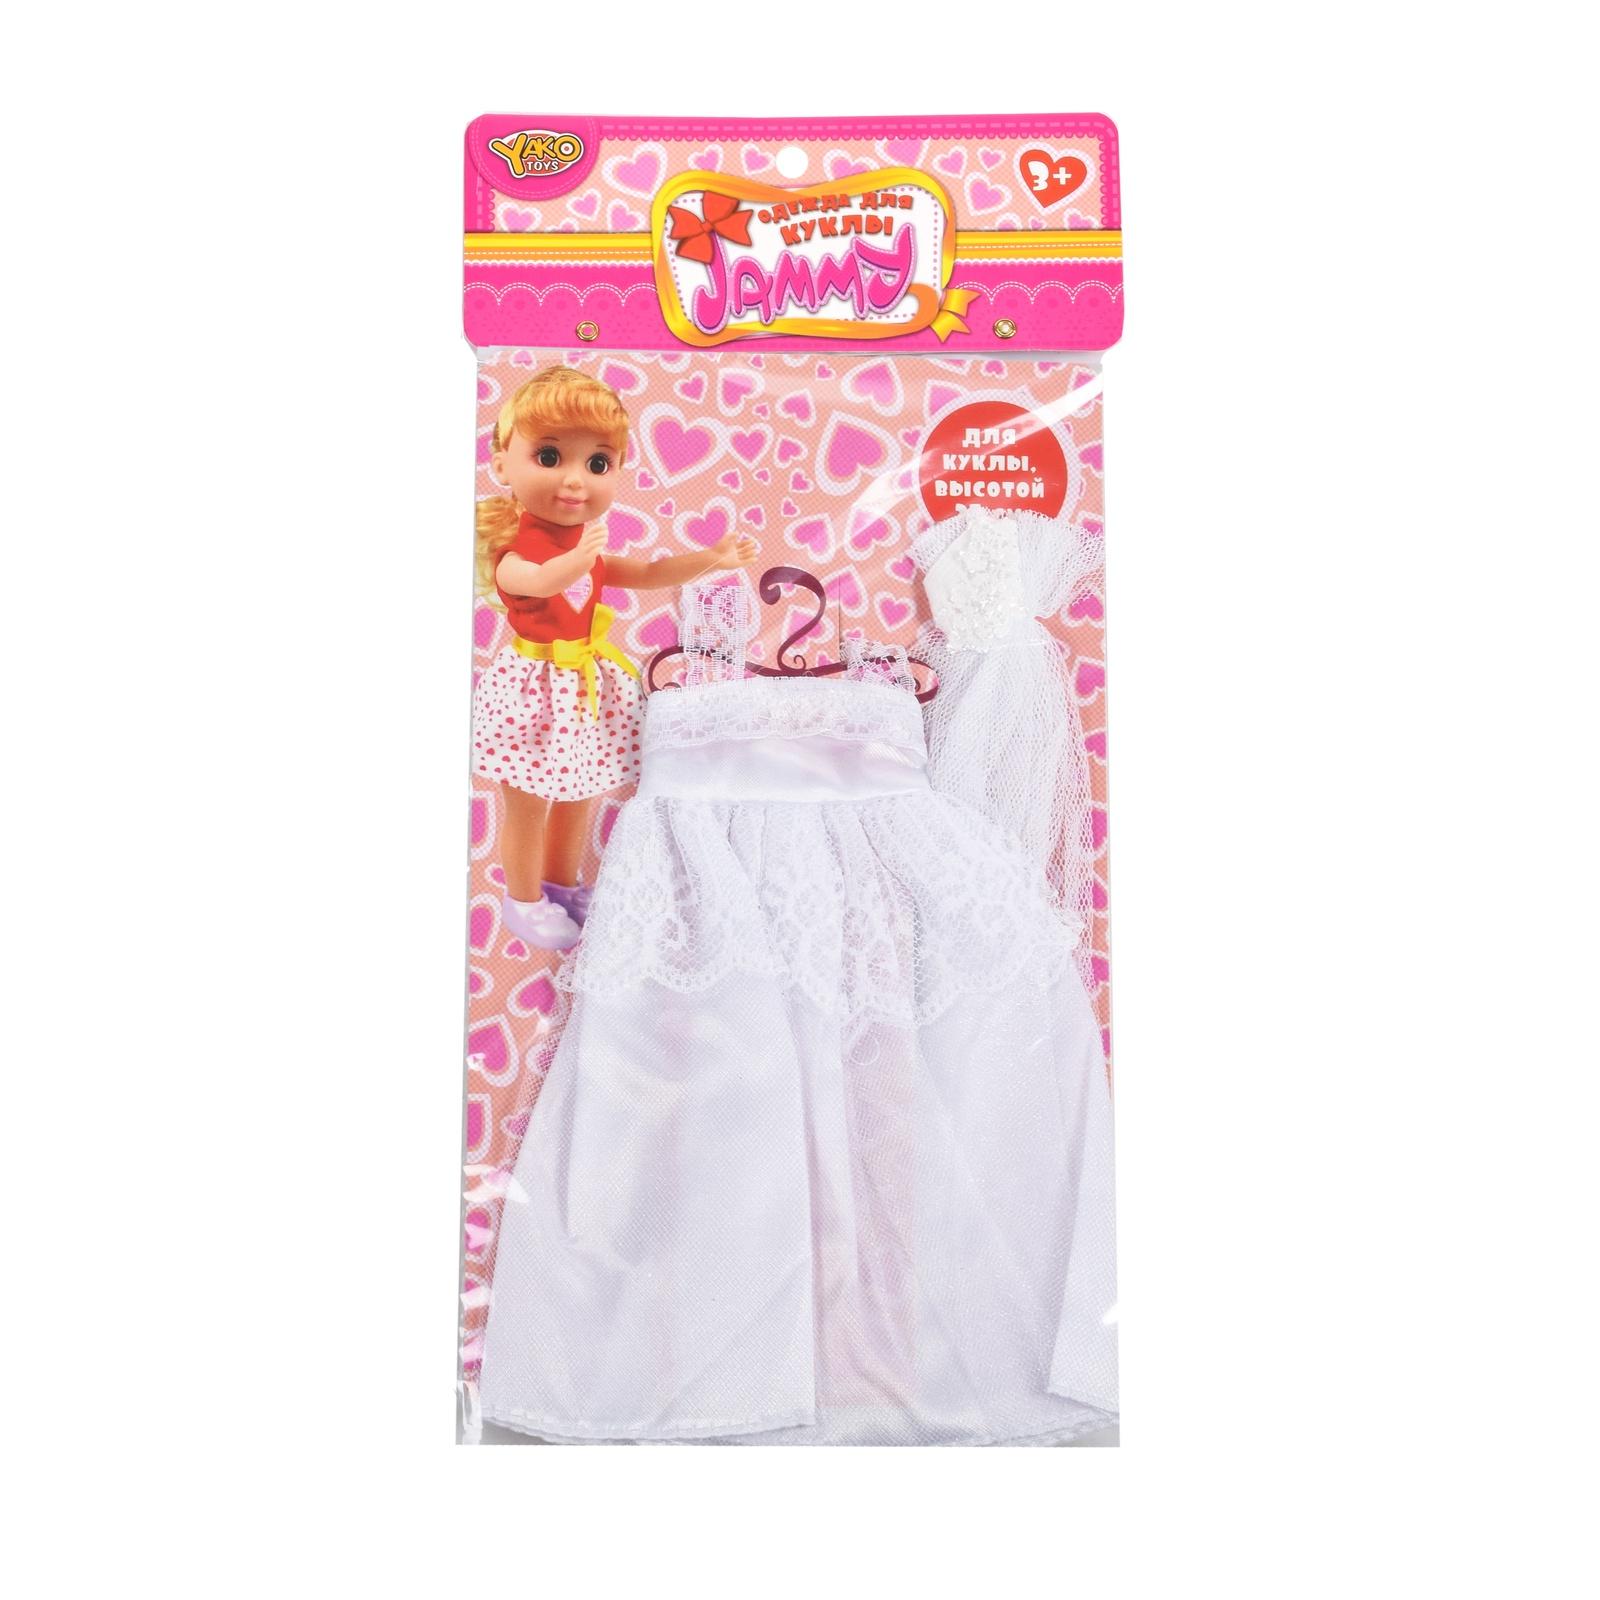 Одежда для кукол Jammy 25 см